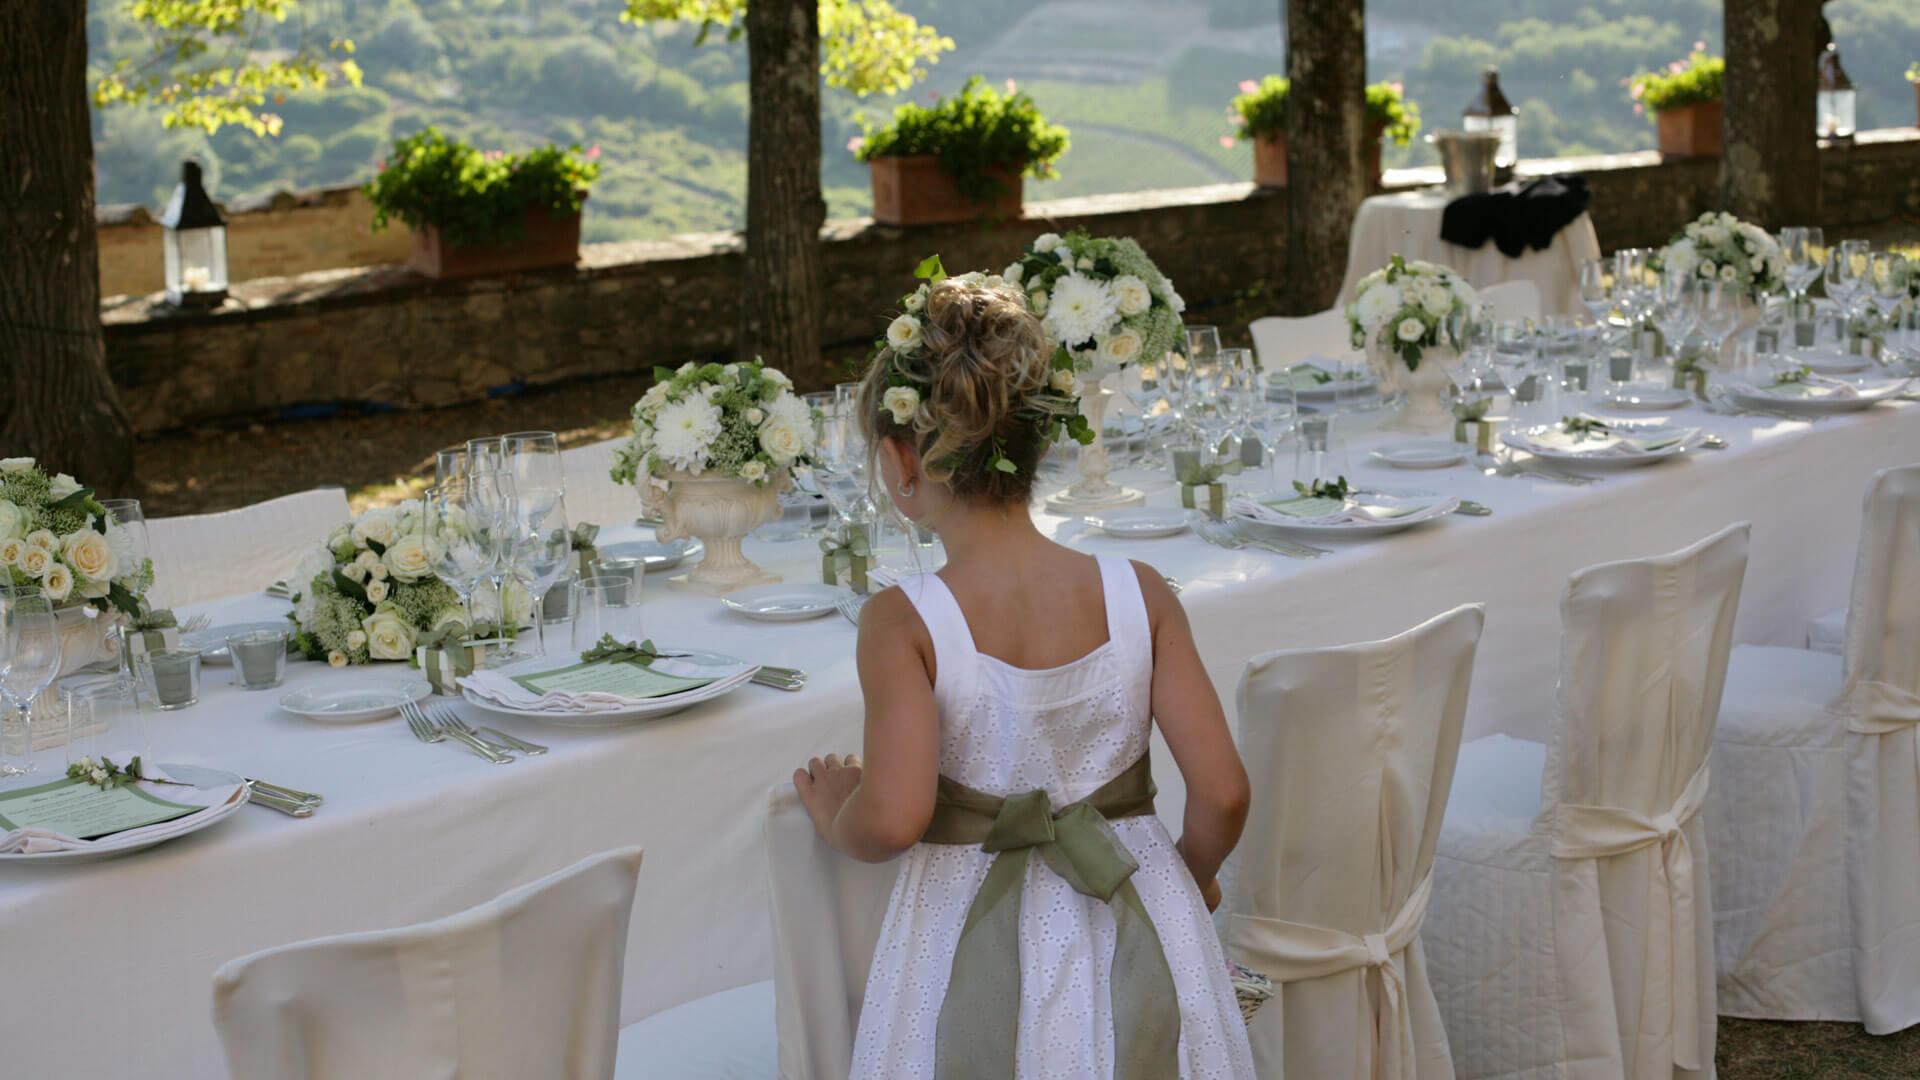 Bianco_essenziale_Wedding_Fiorile_firenze_4